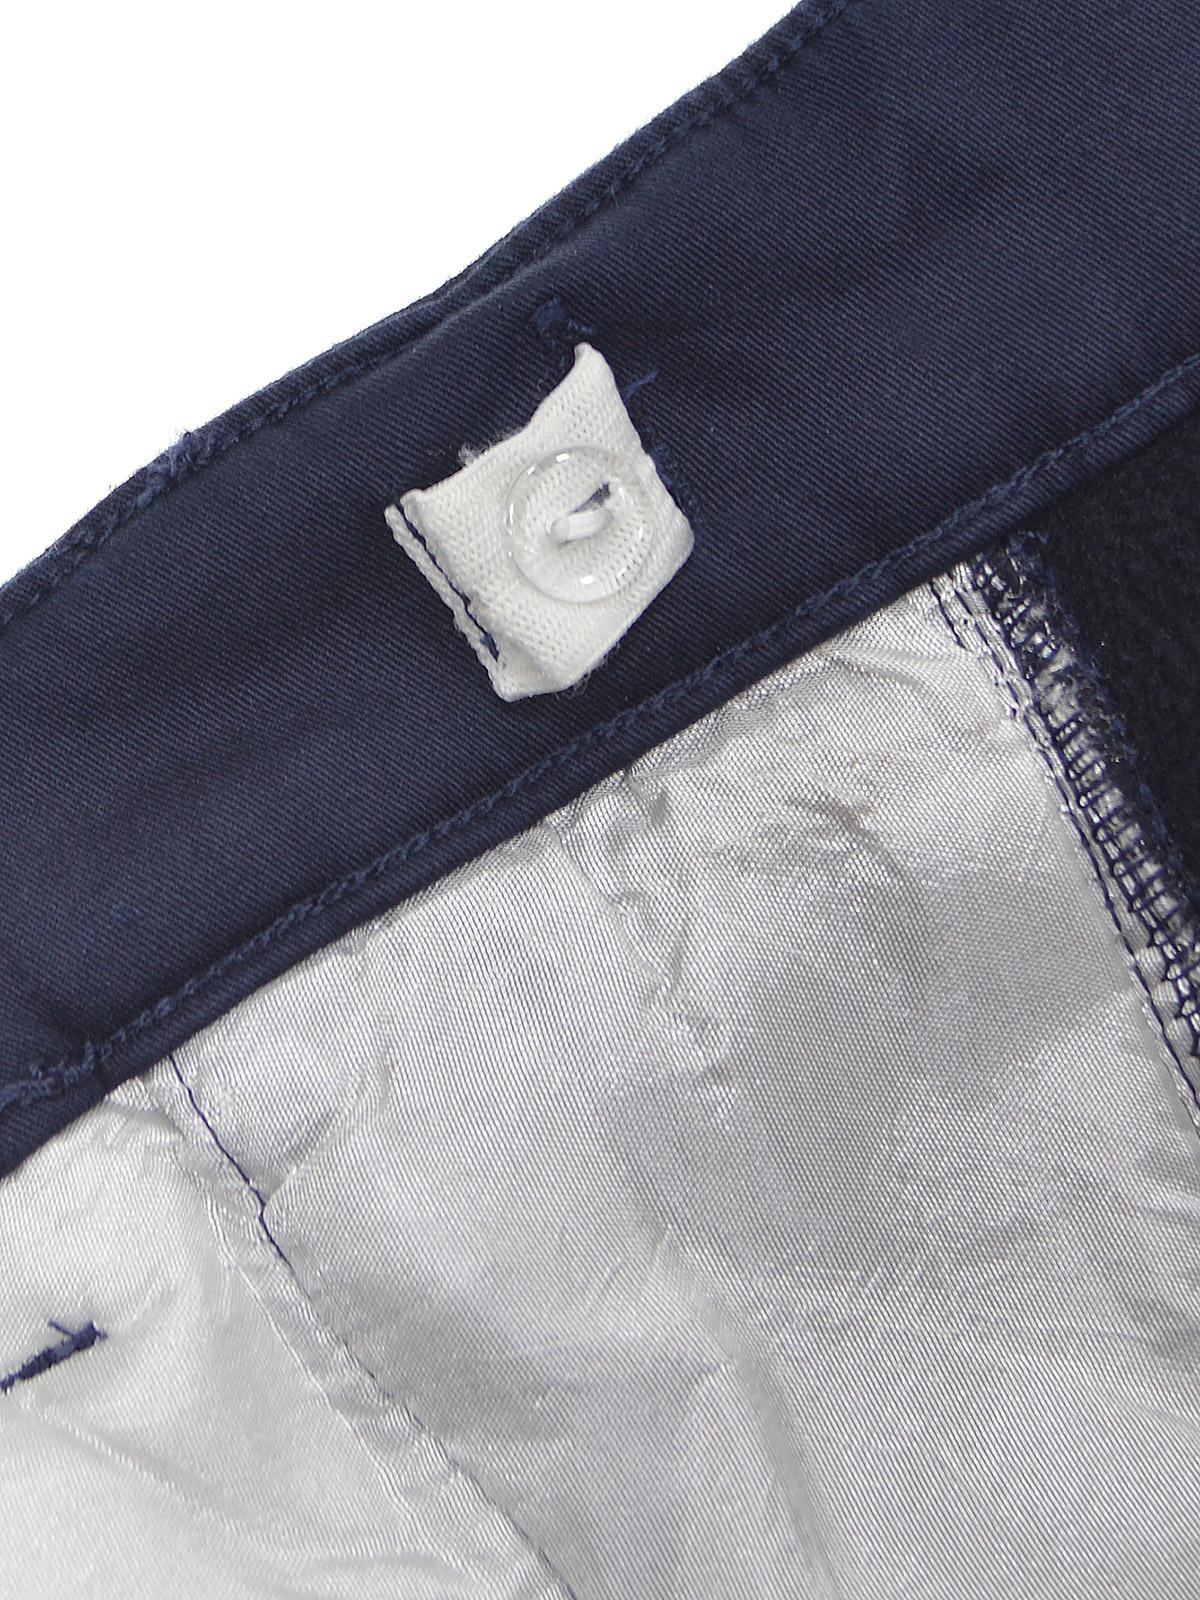 Enfants-Chino-THERMO-d-039-hiver-Pantalons-Garcons-Pantalon-Doublure-Stretch-Reglable-22904 miniature 5